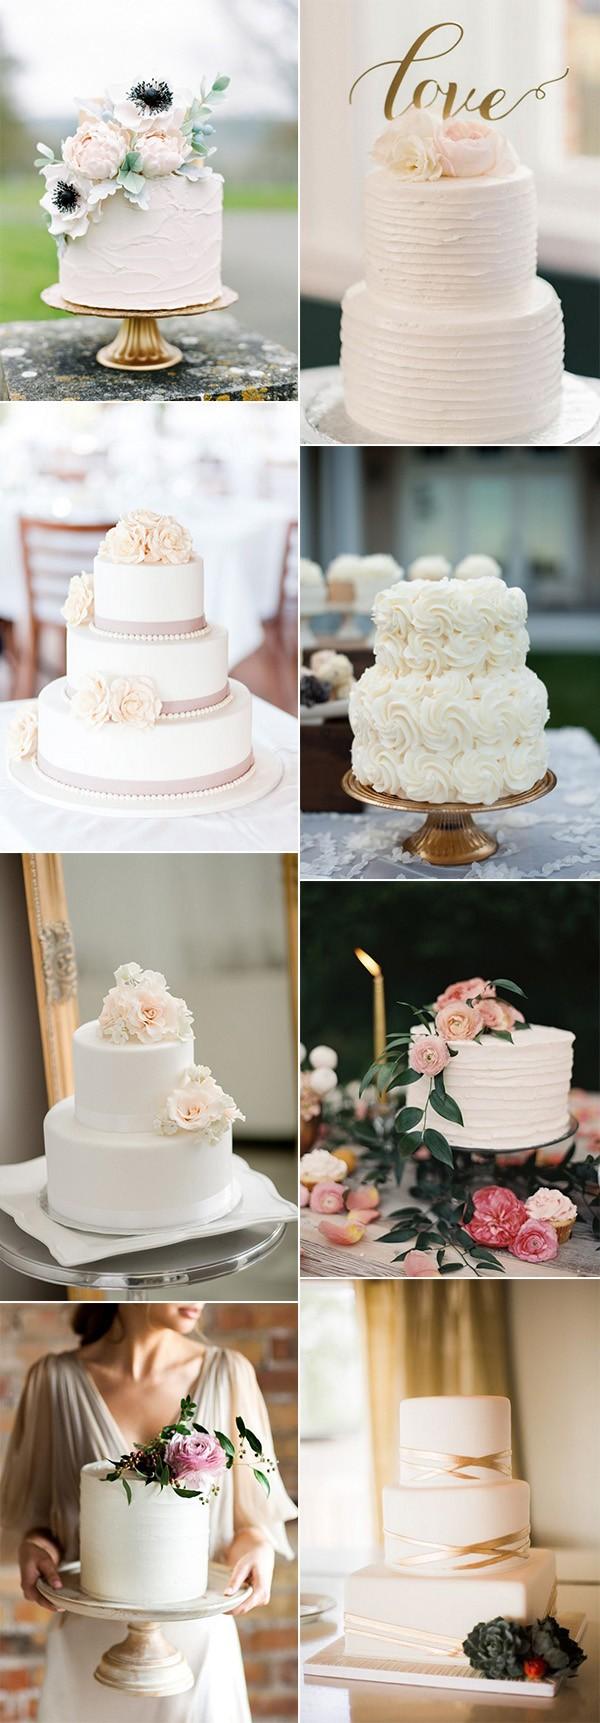 trending simple but elegant wedding cakes